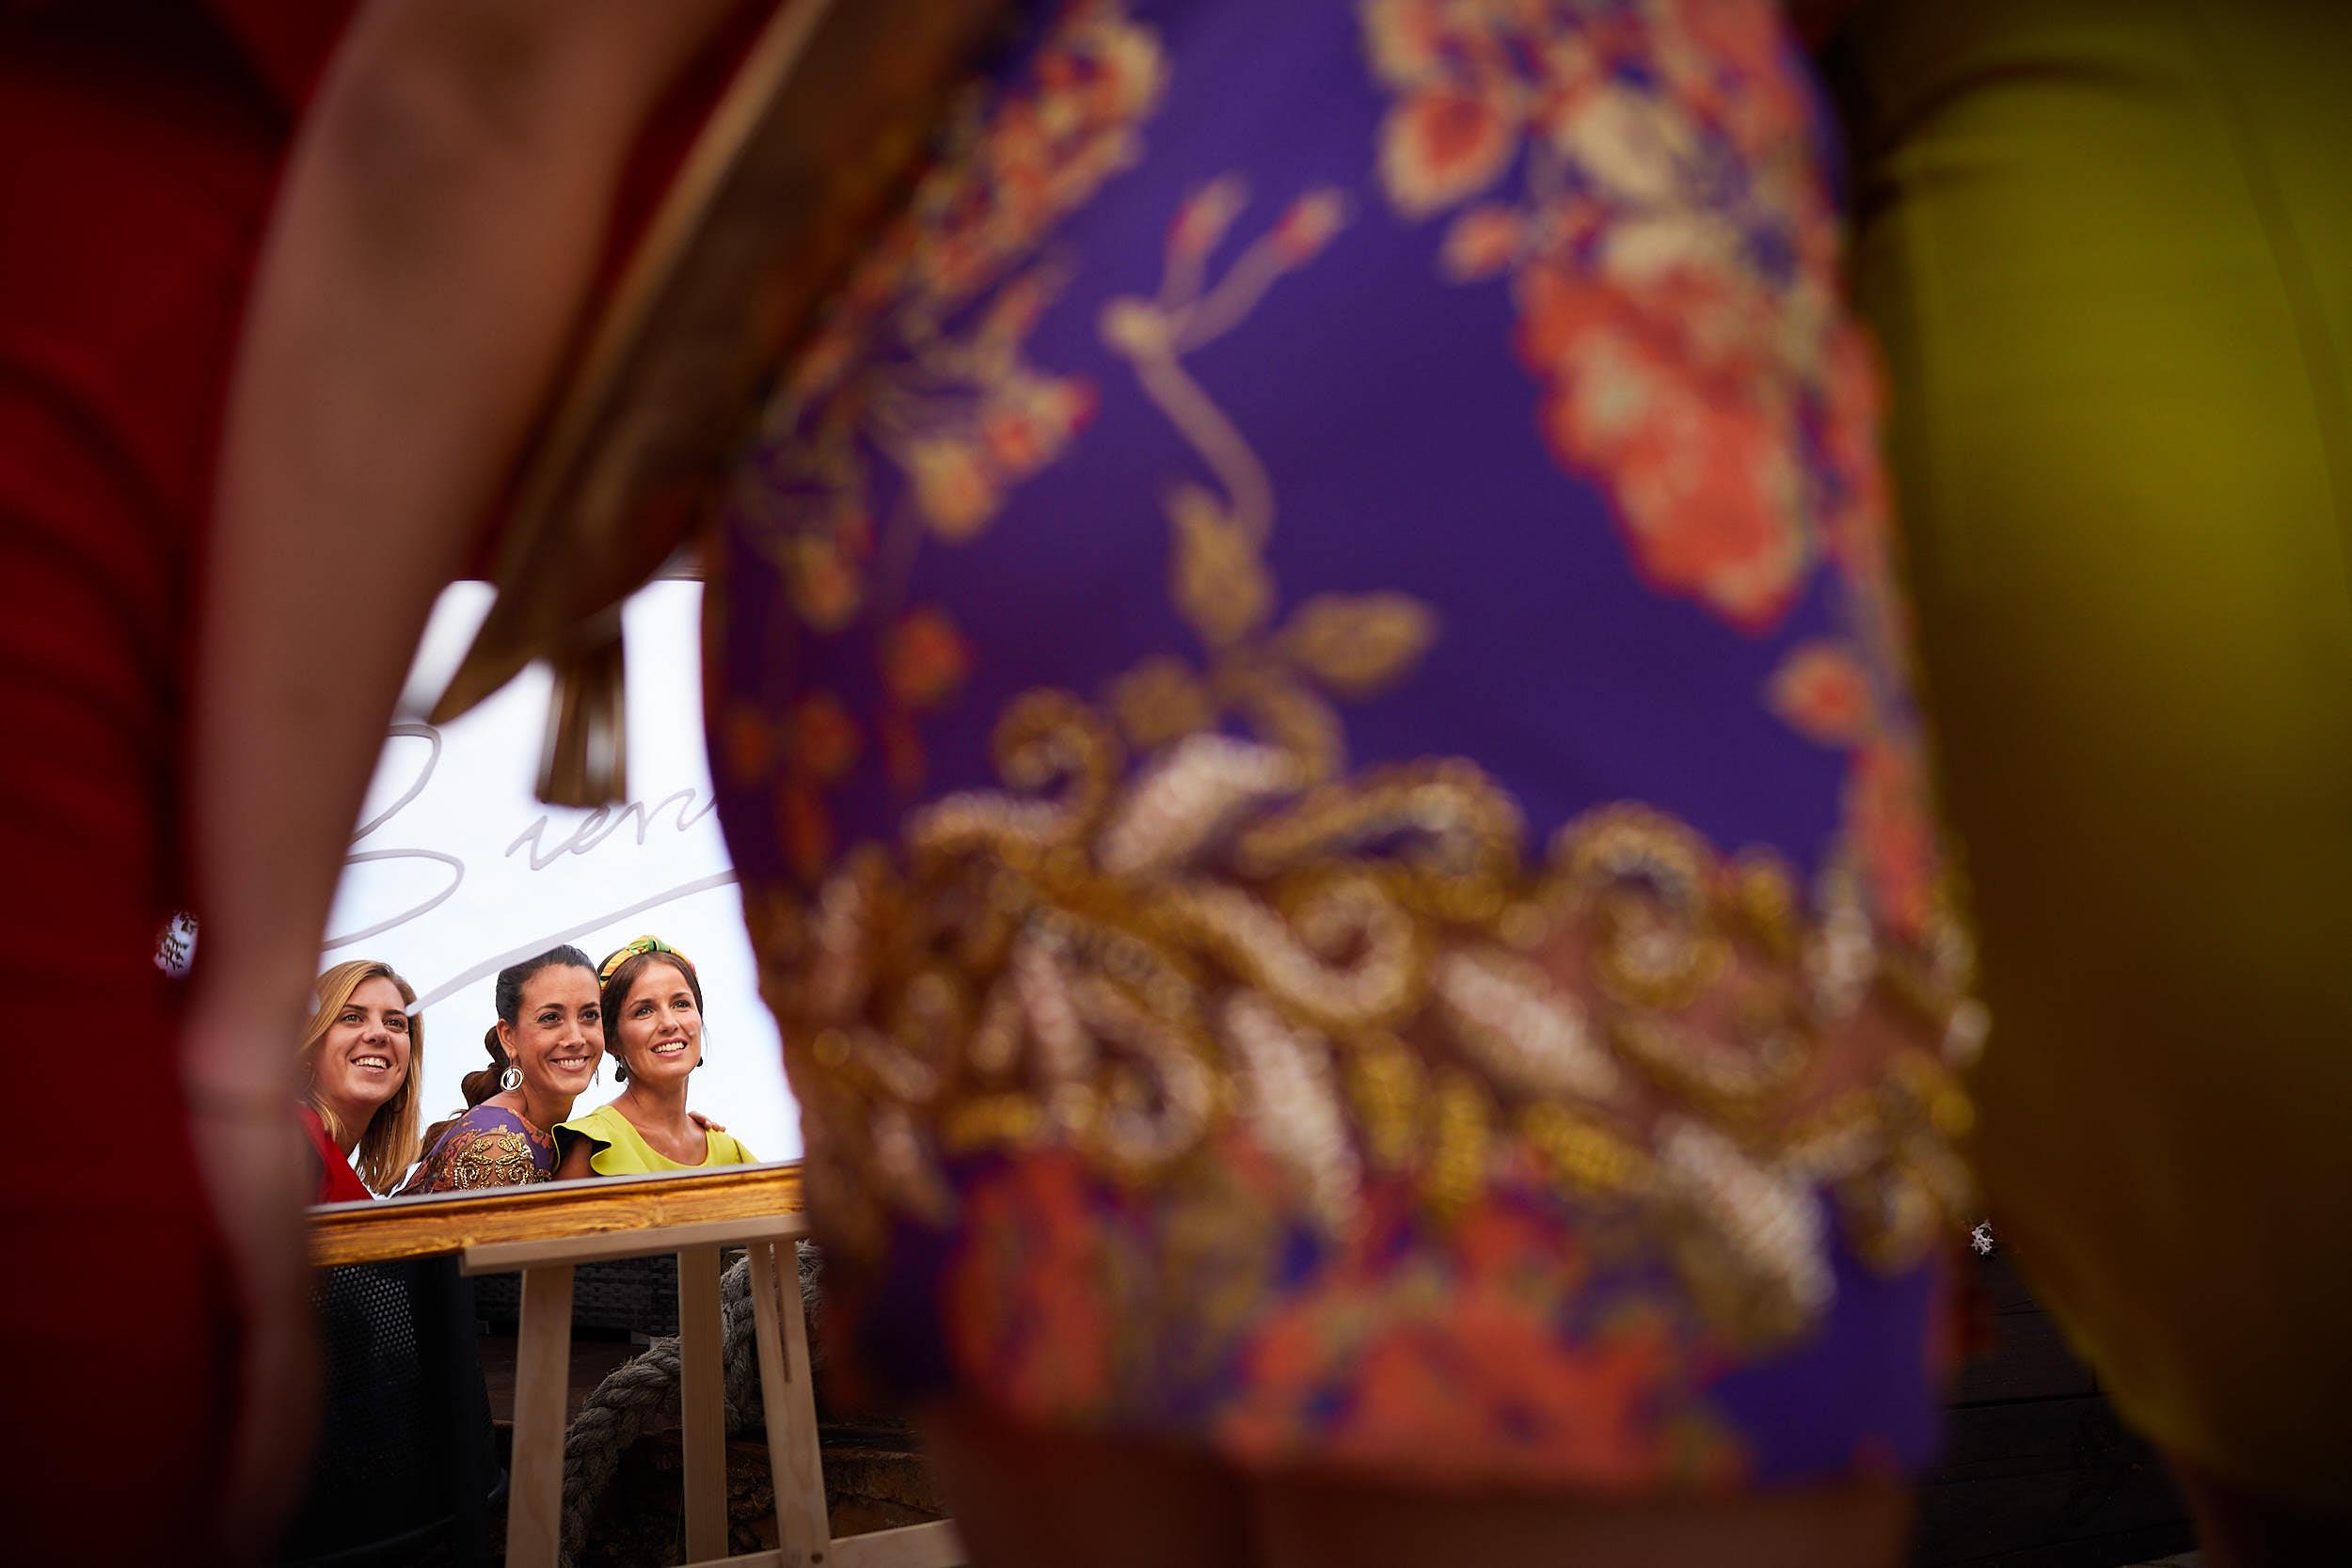 Amzaing_Wedding_photos_La_Rioja_Spain_Sturcke_005.jpg